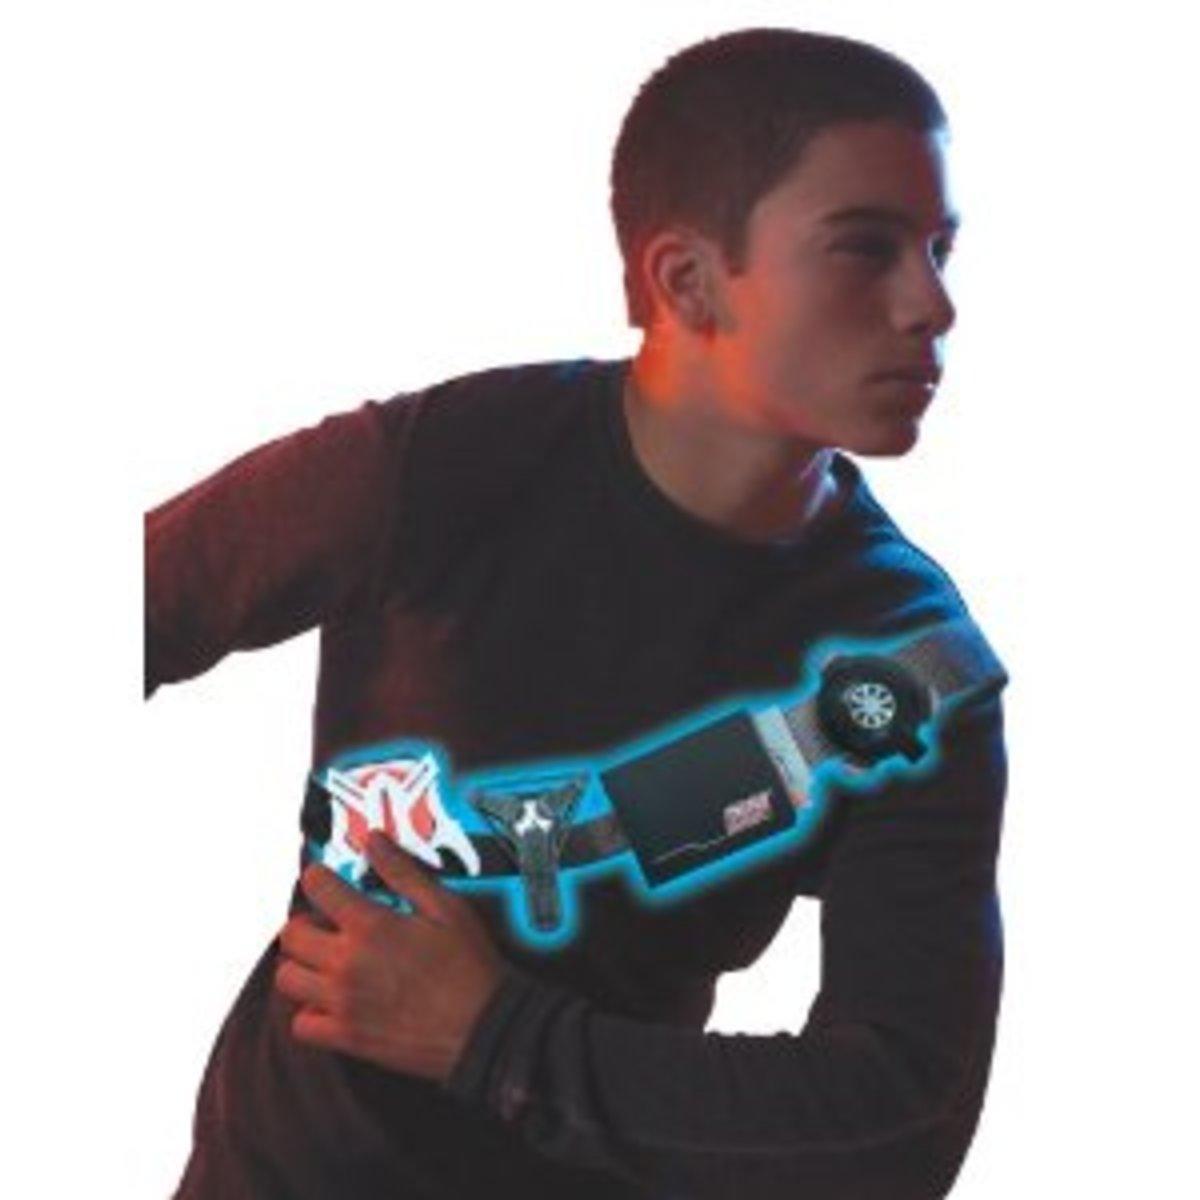 spy-gear-for-kids-2